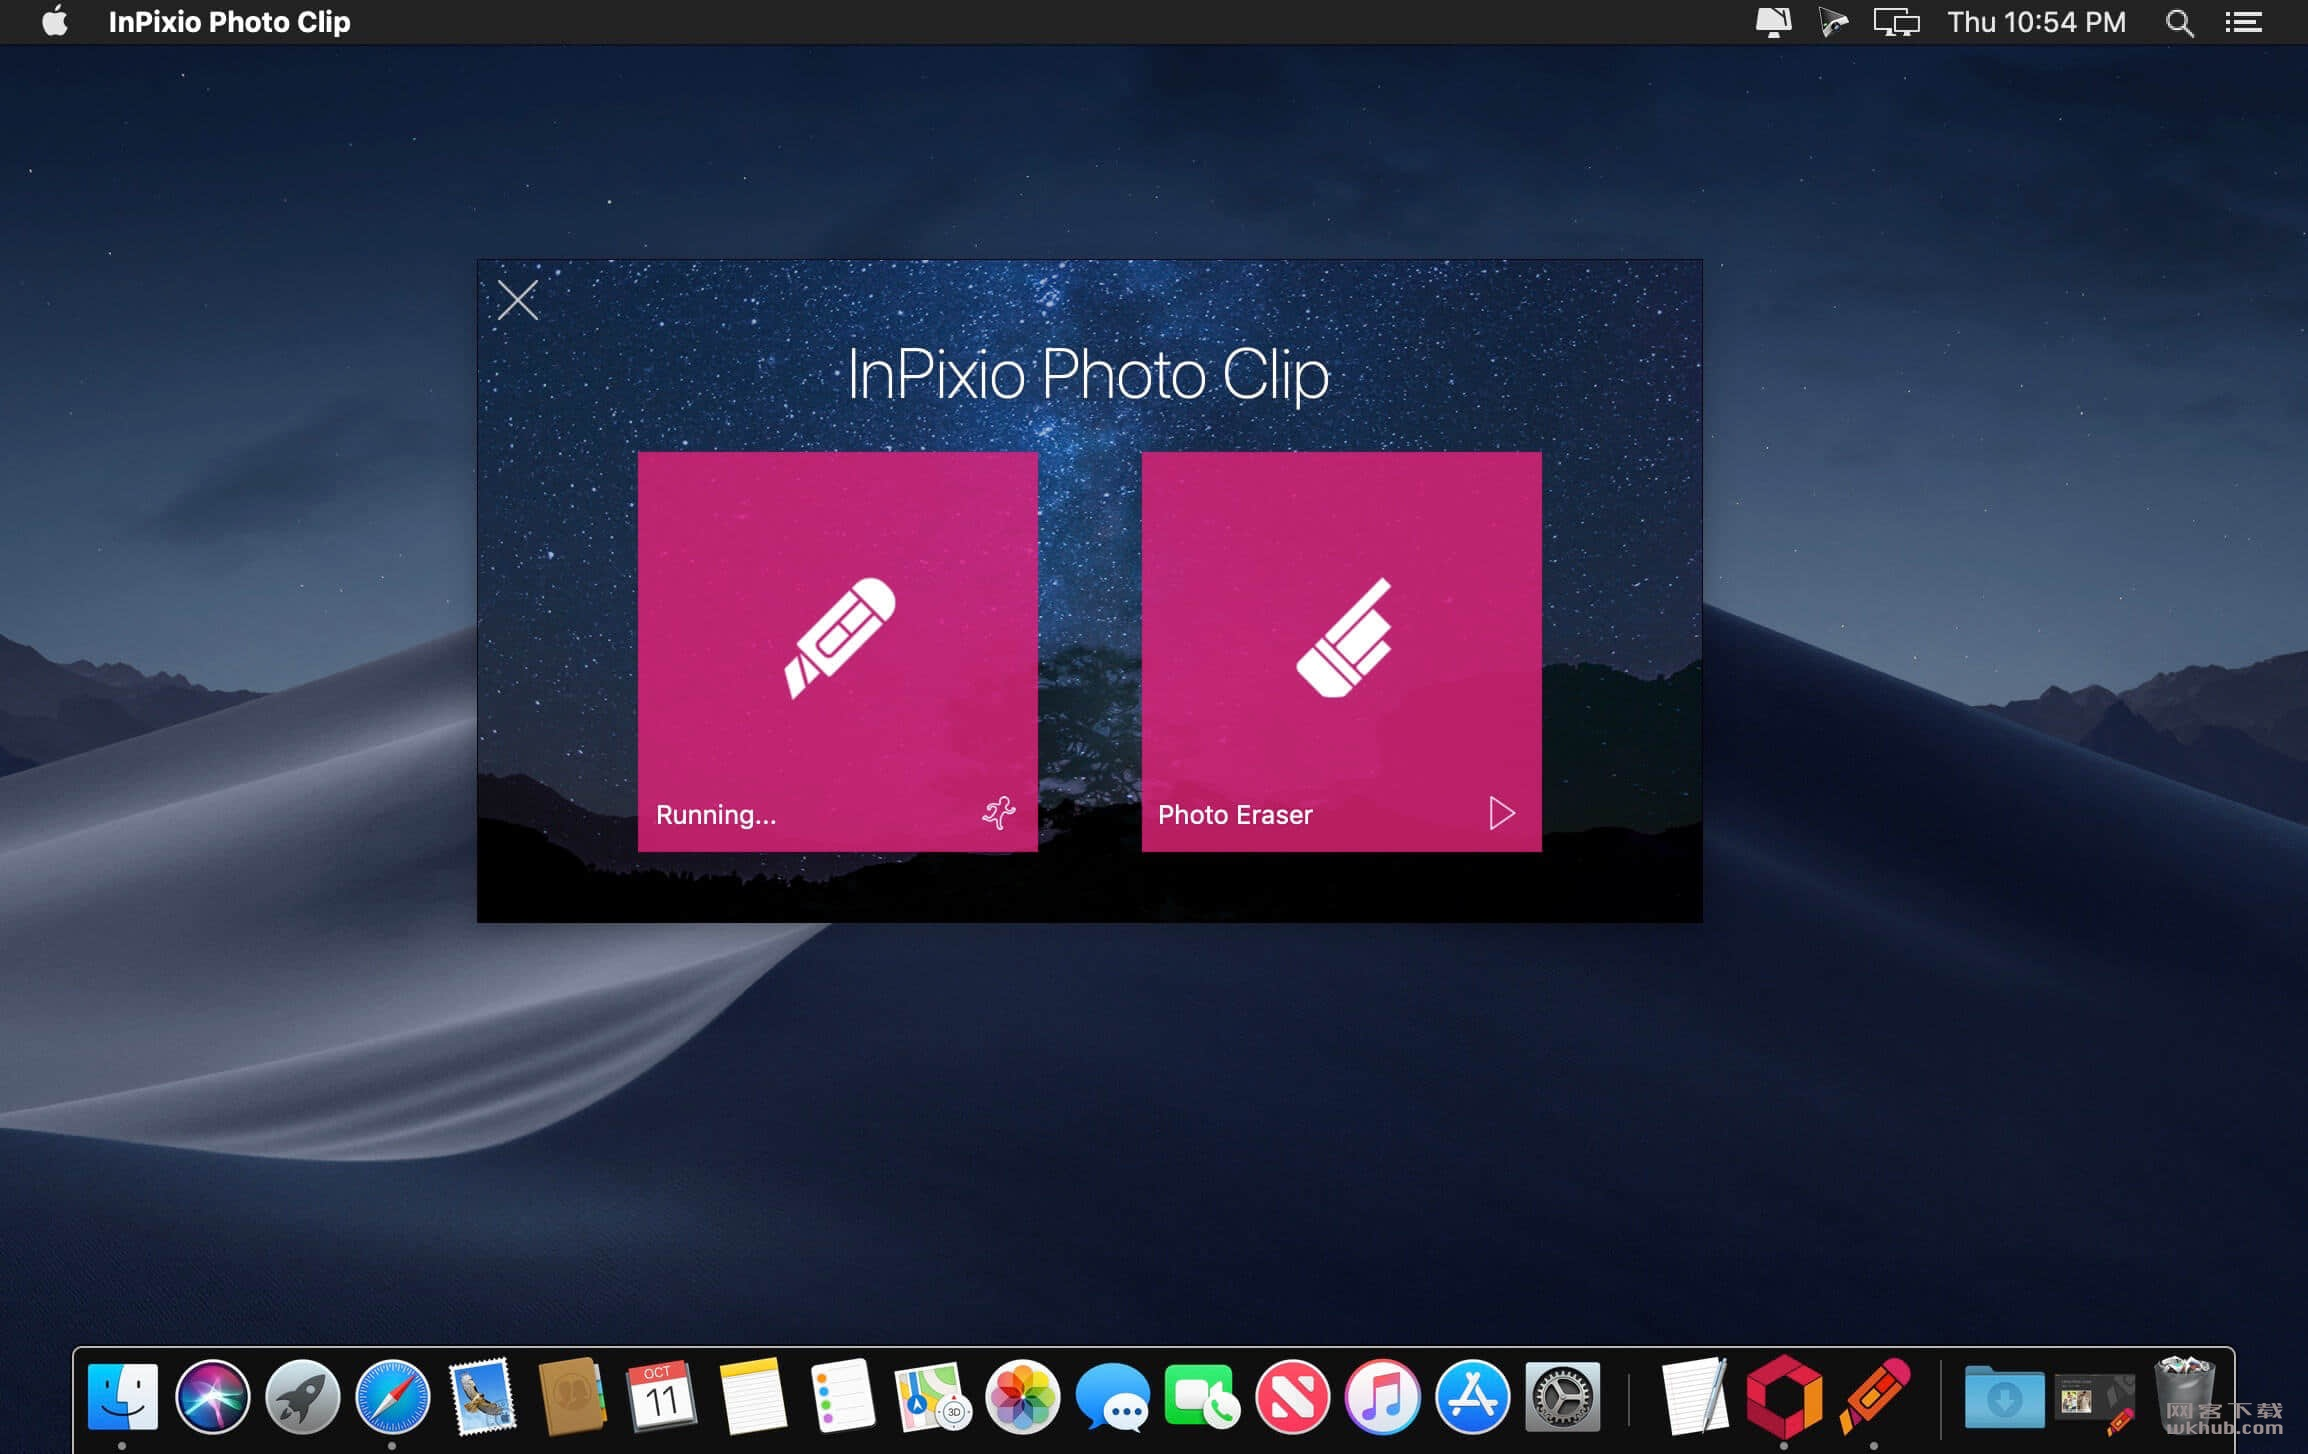 InPixio Photo Clip 1.1.7 照片剪辑工具